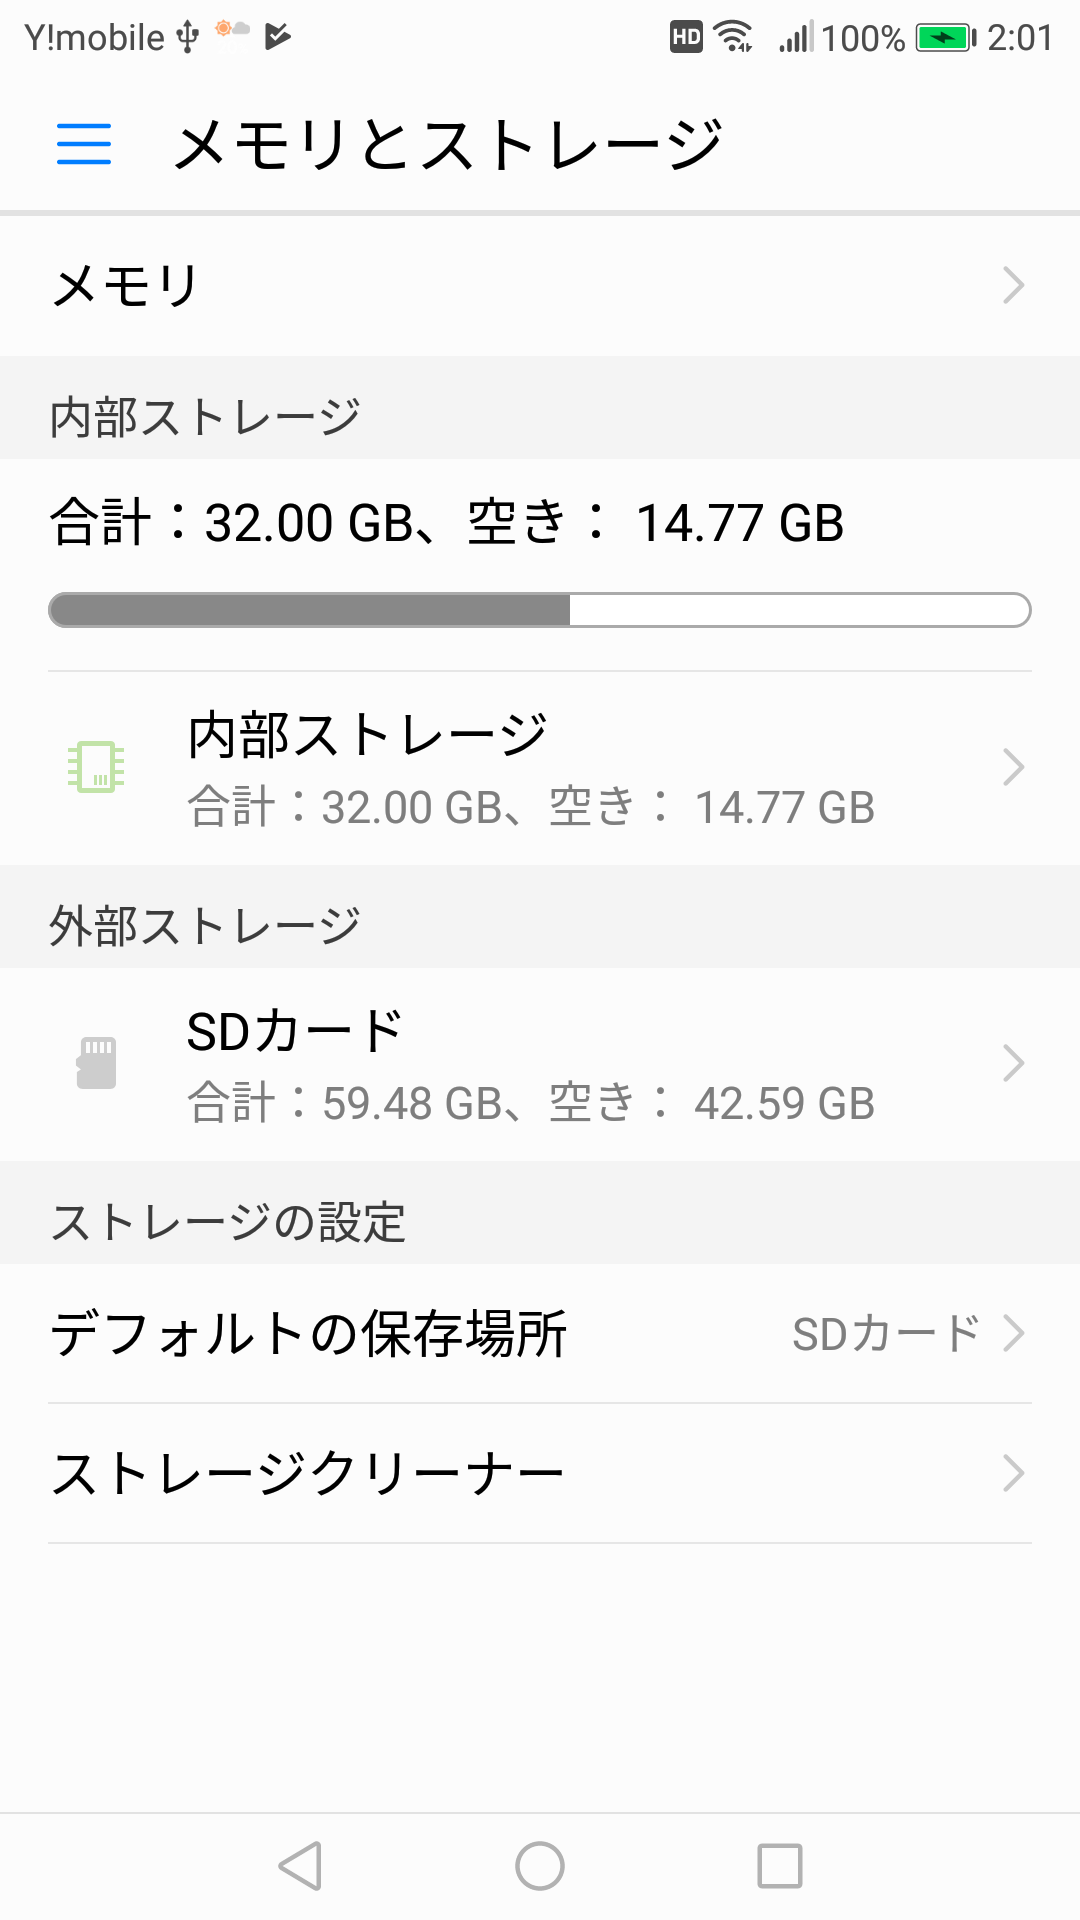 http://konozama.jp/amazon_devil/photo/Screenshot_20171210-020118.png